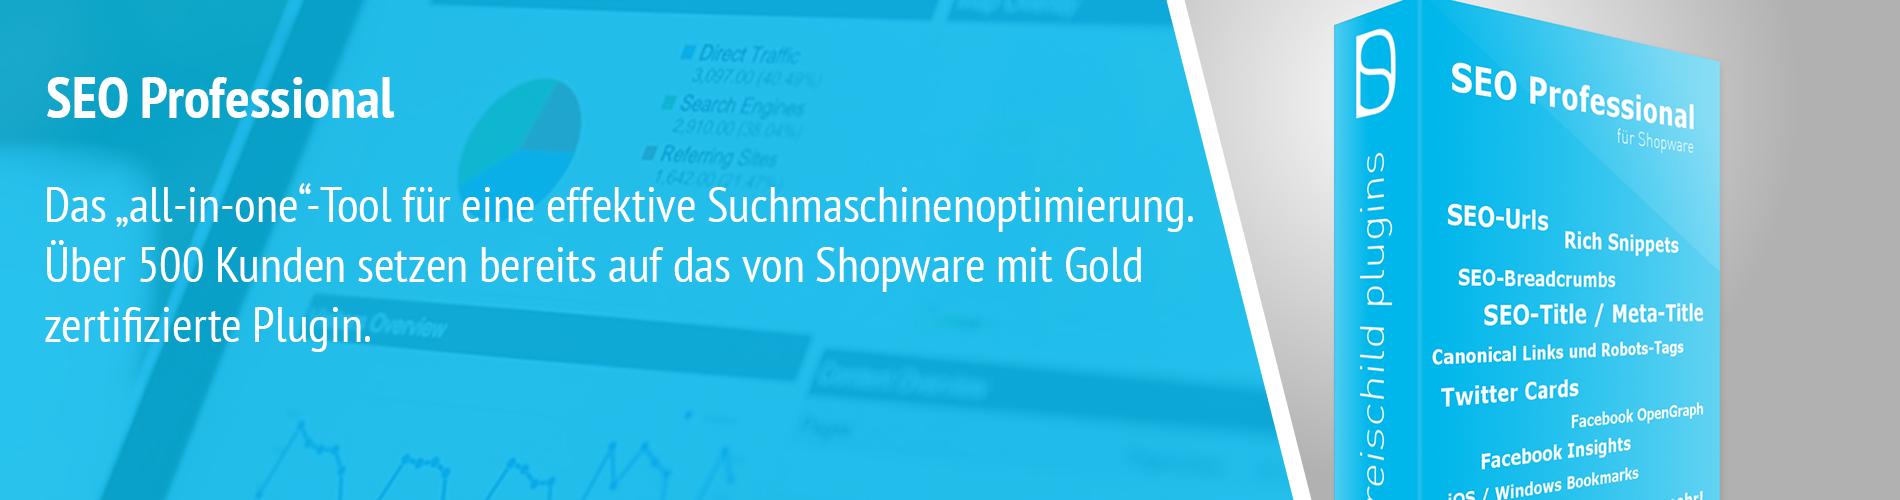 Shopware SEO Optimierung mit SEO Professional